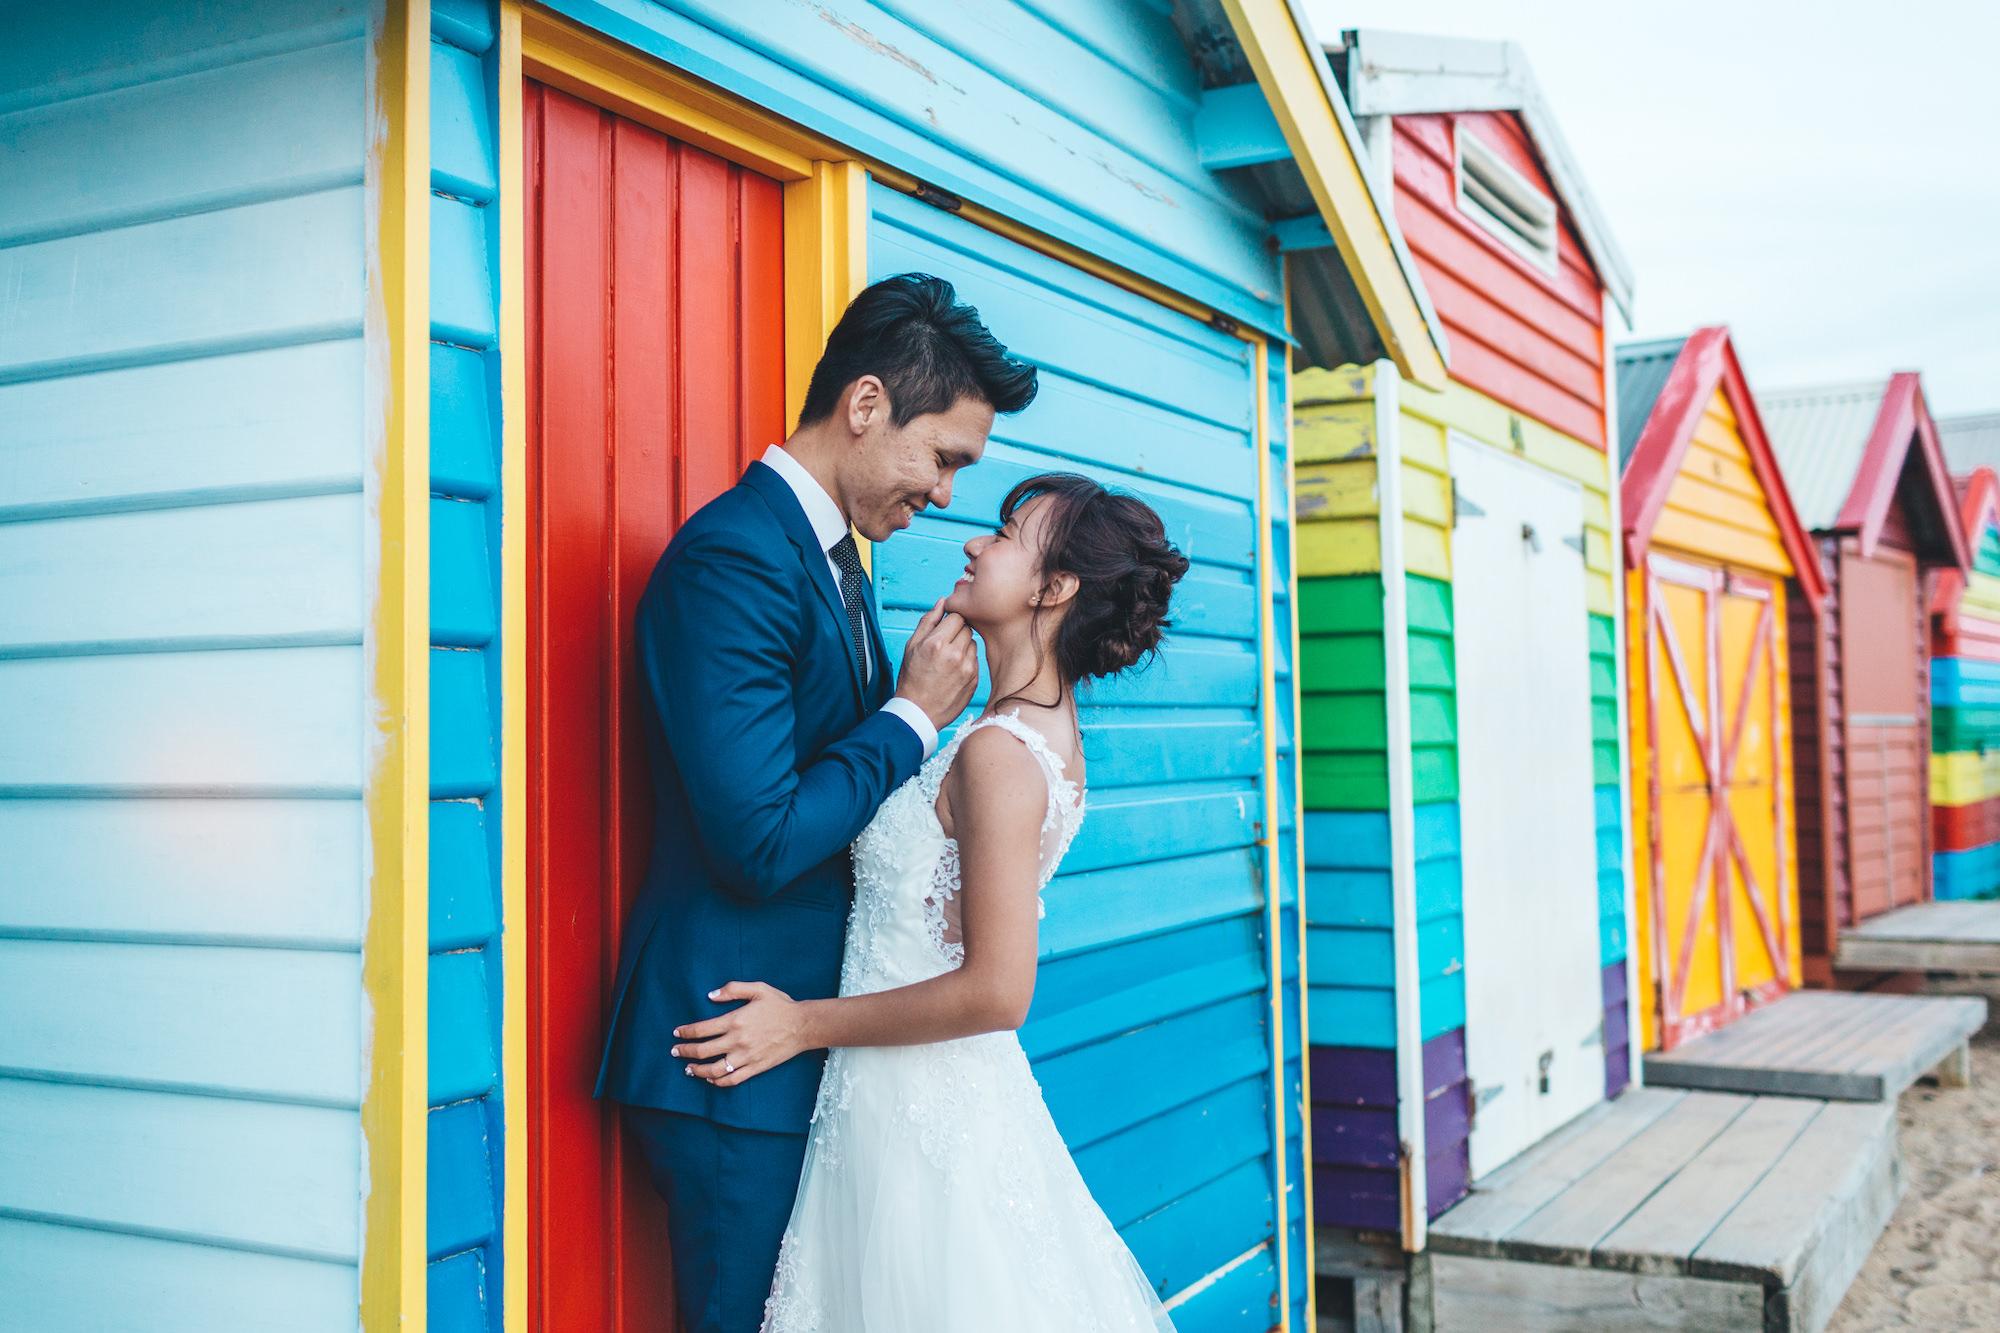 Claire & Charles - Melbourne Prewedding 11.jpg